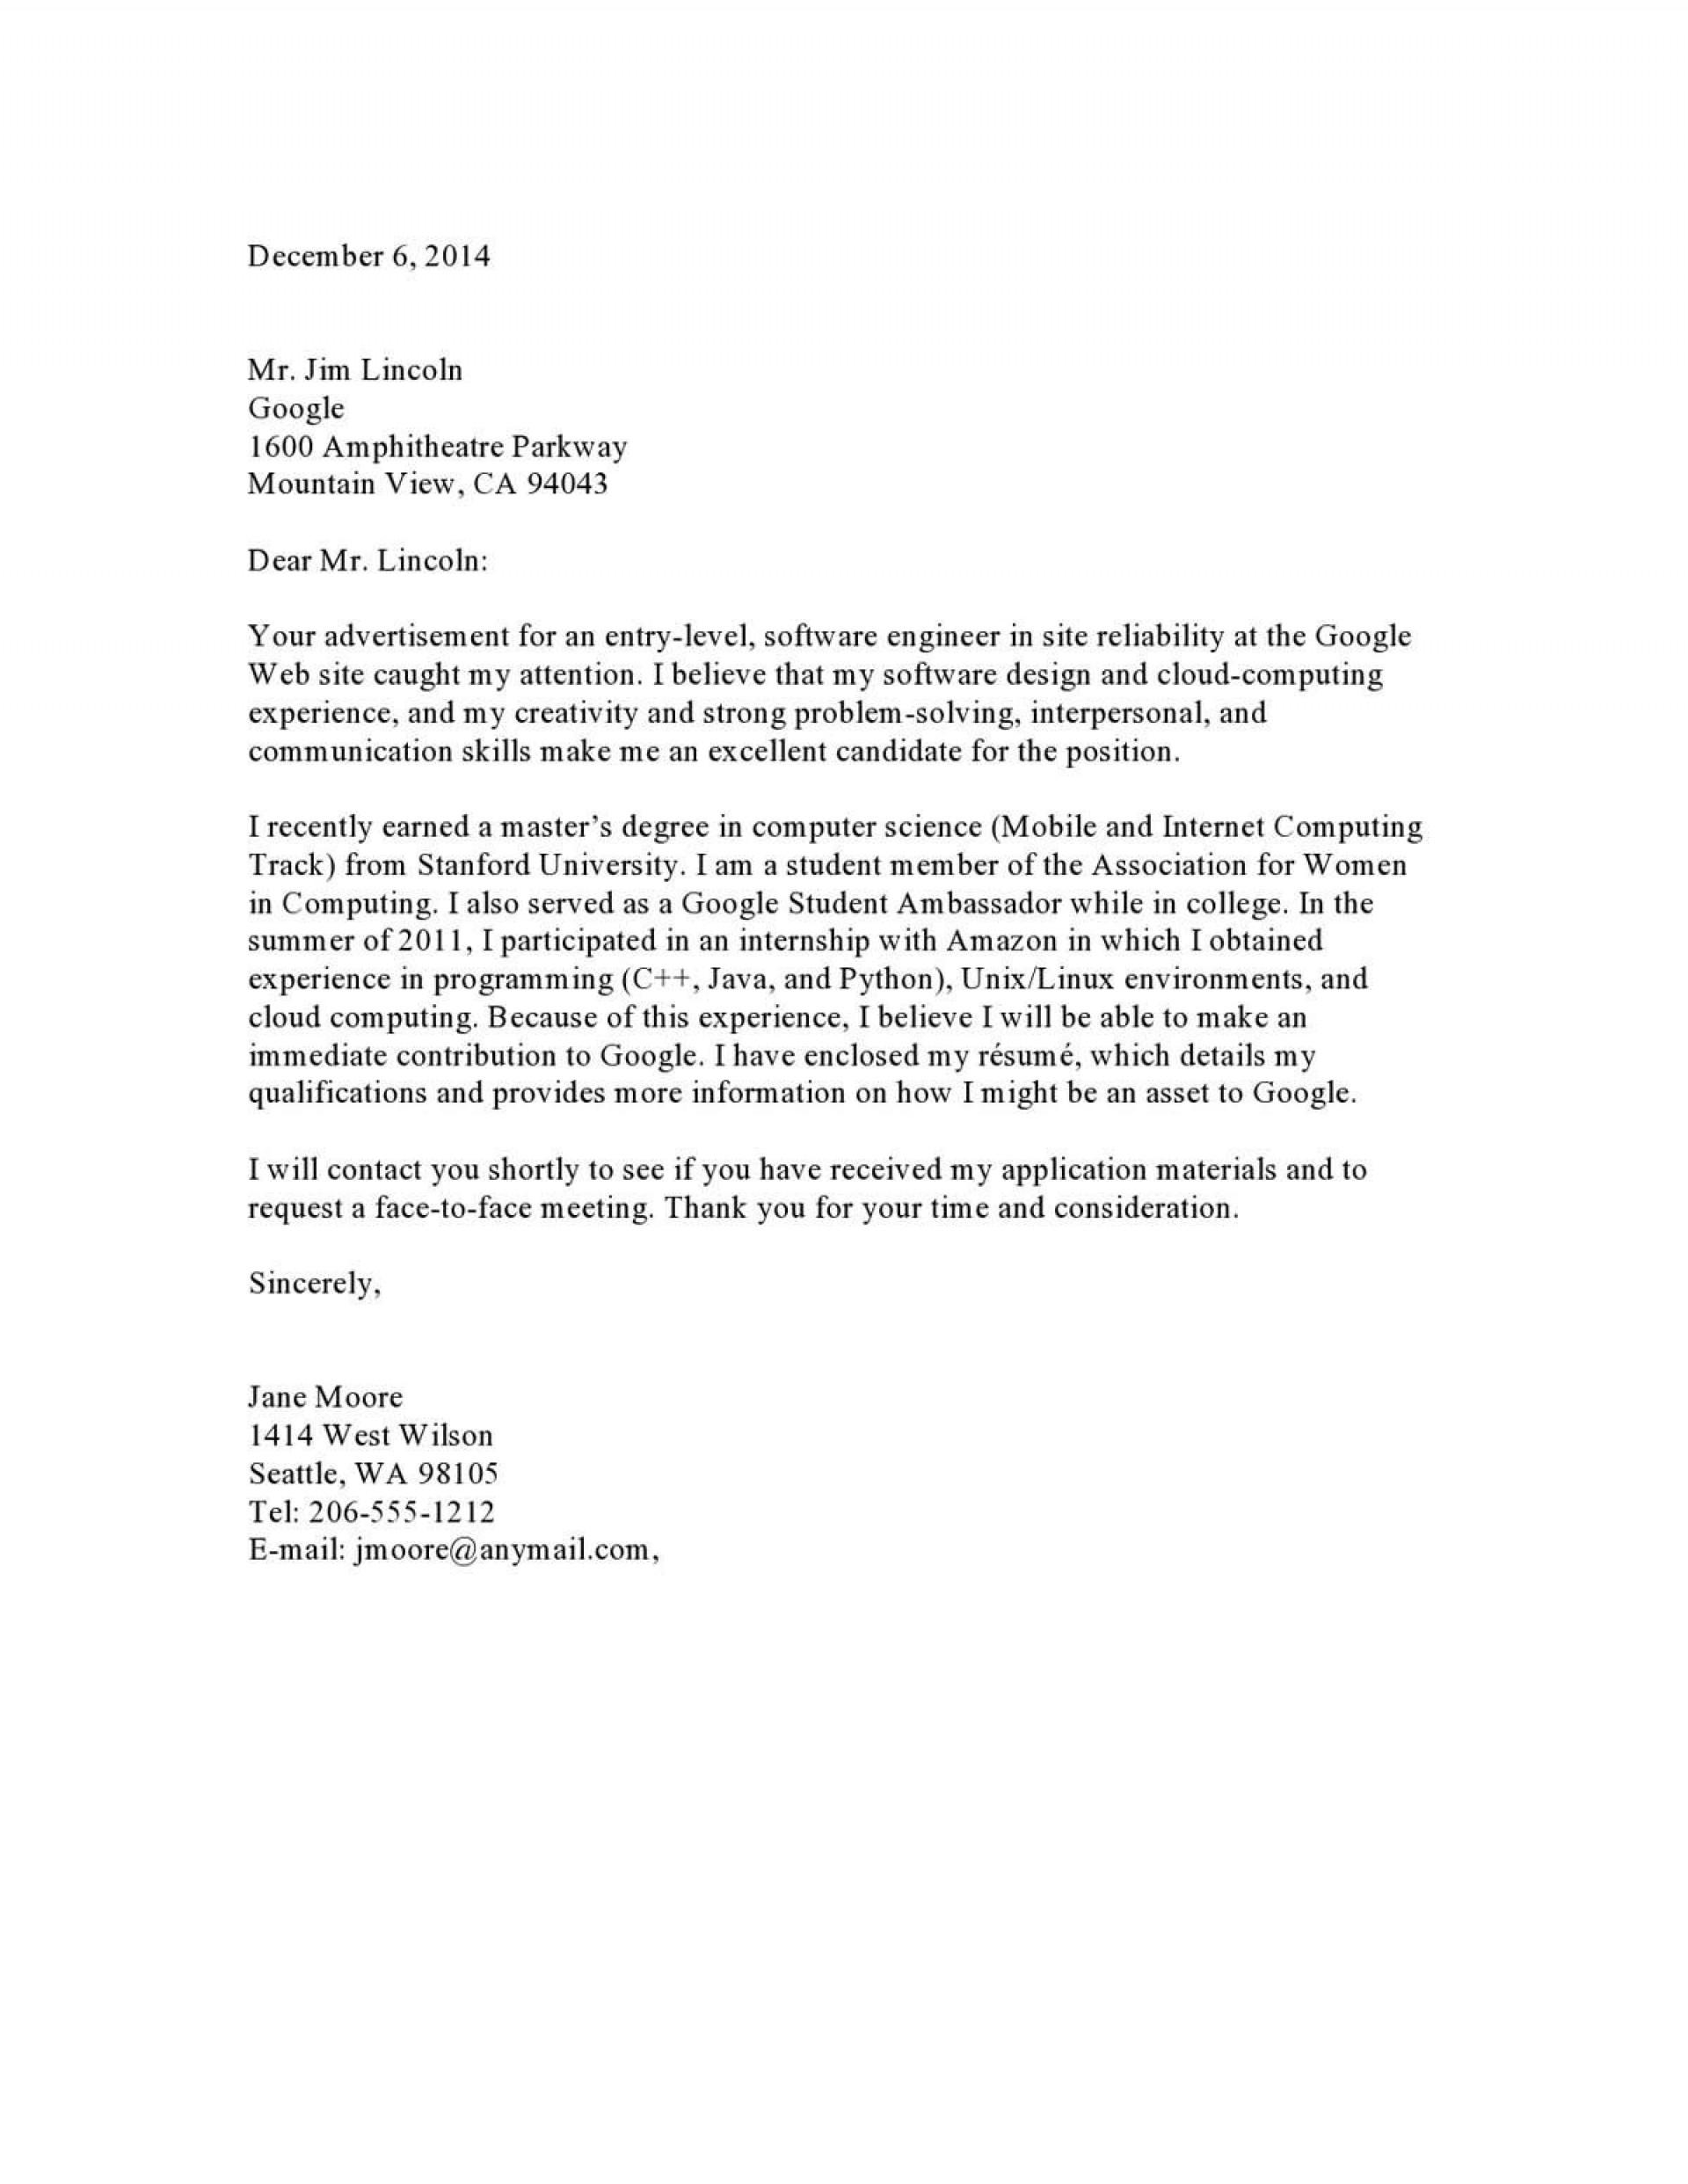 004 Unique Basic Covering Letter Template Concept  Simple Application Job Sample Cover1920